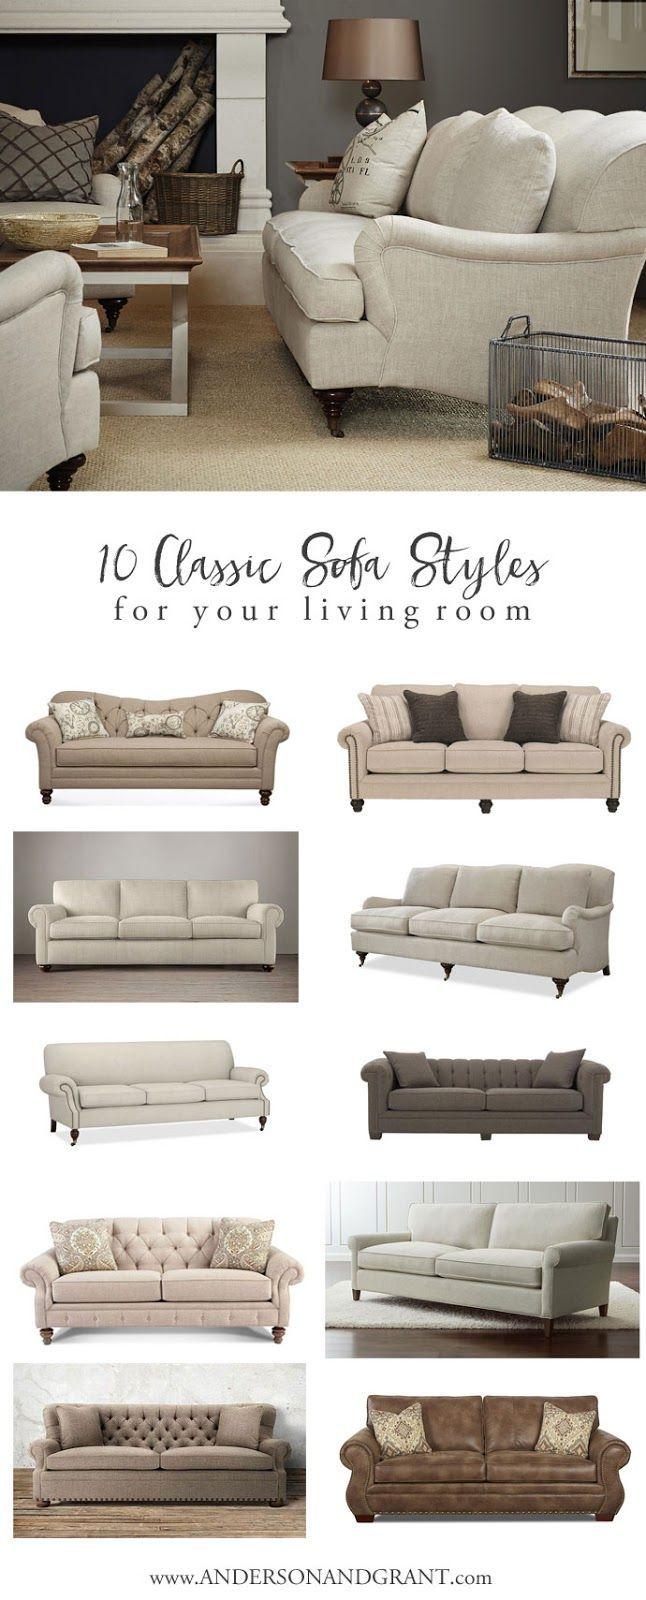 Best 25+ Classic living room ideas on Pinterest | Living ...